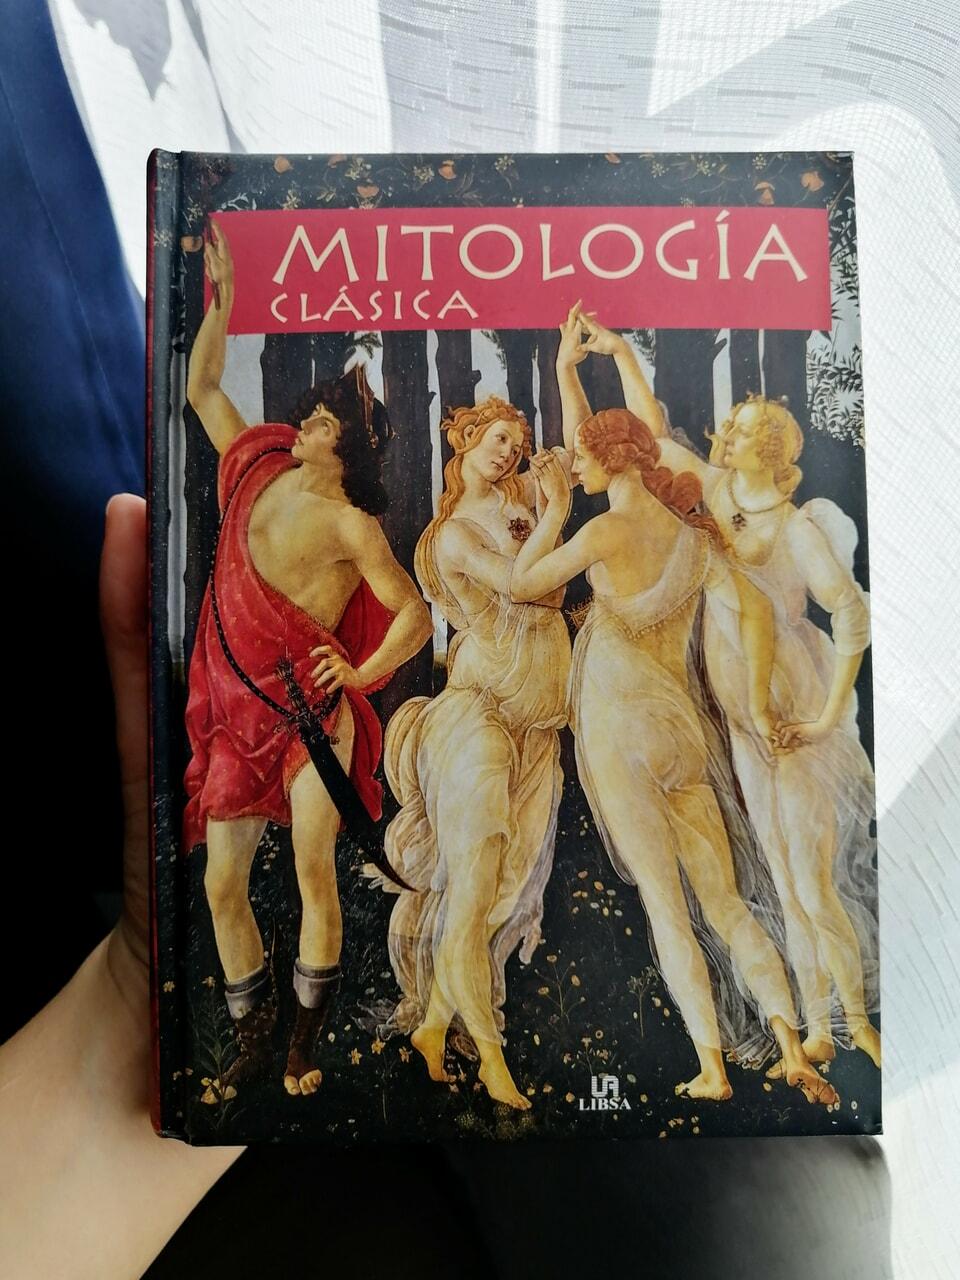 mitologia, leer, and romana image